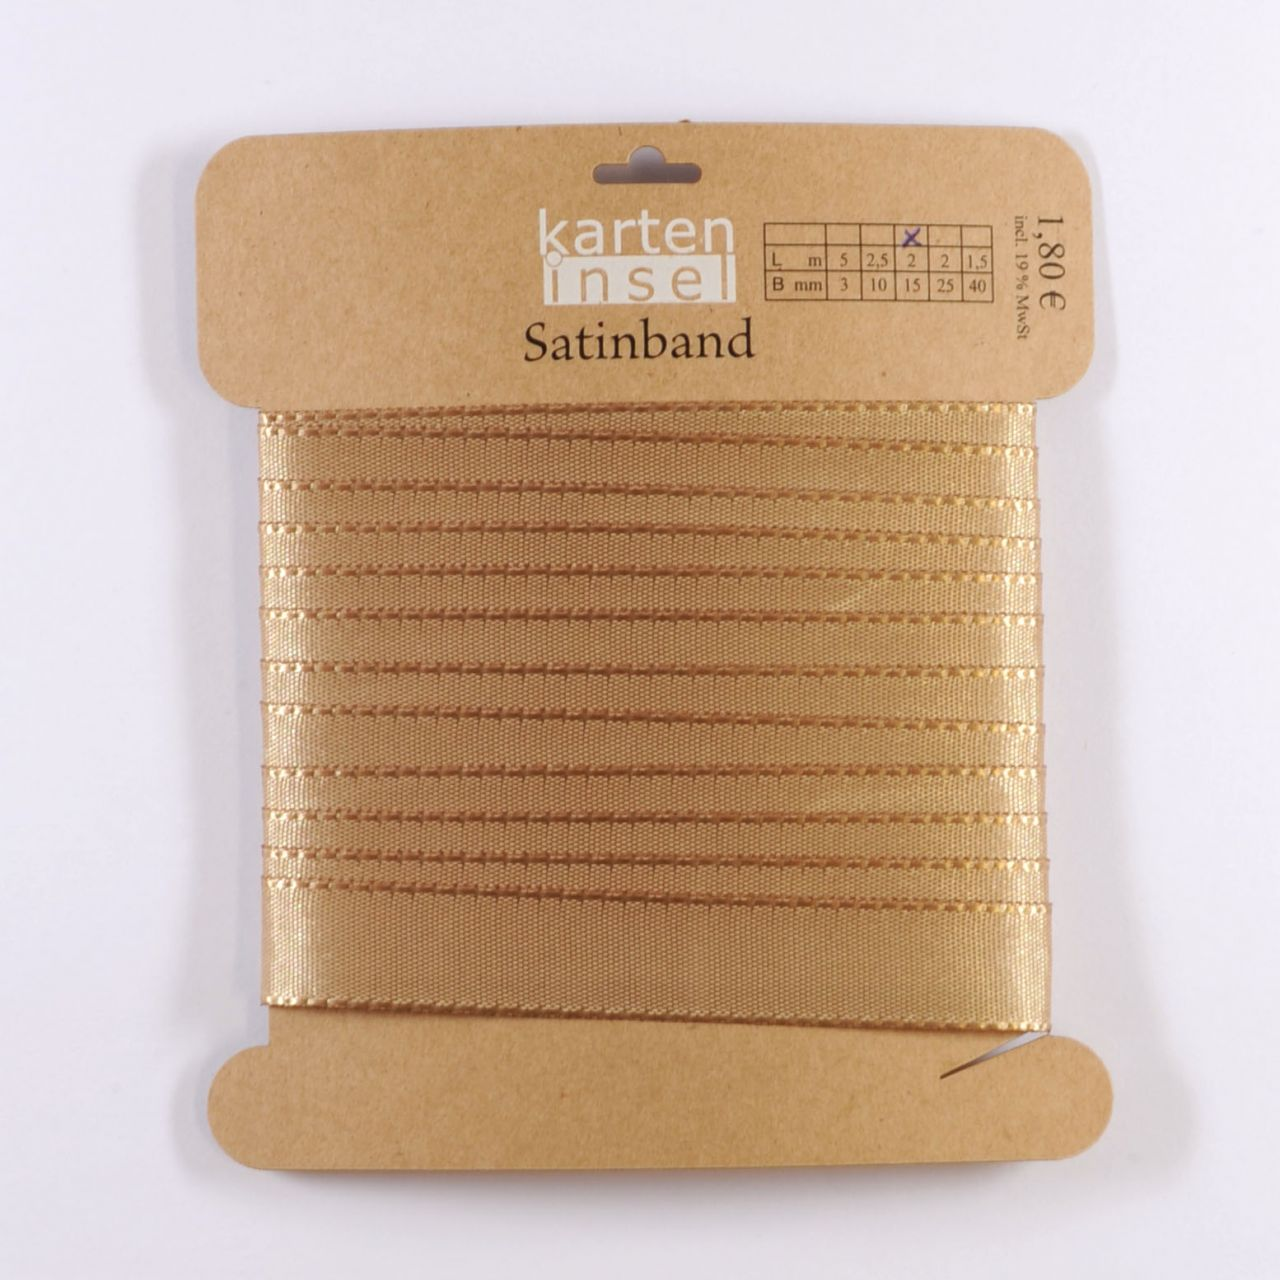 Satinband gold - 15 mm - 2 m